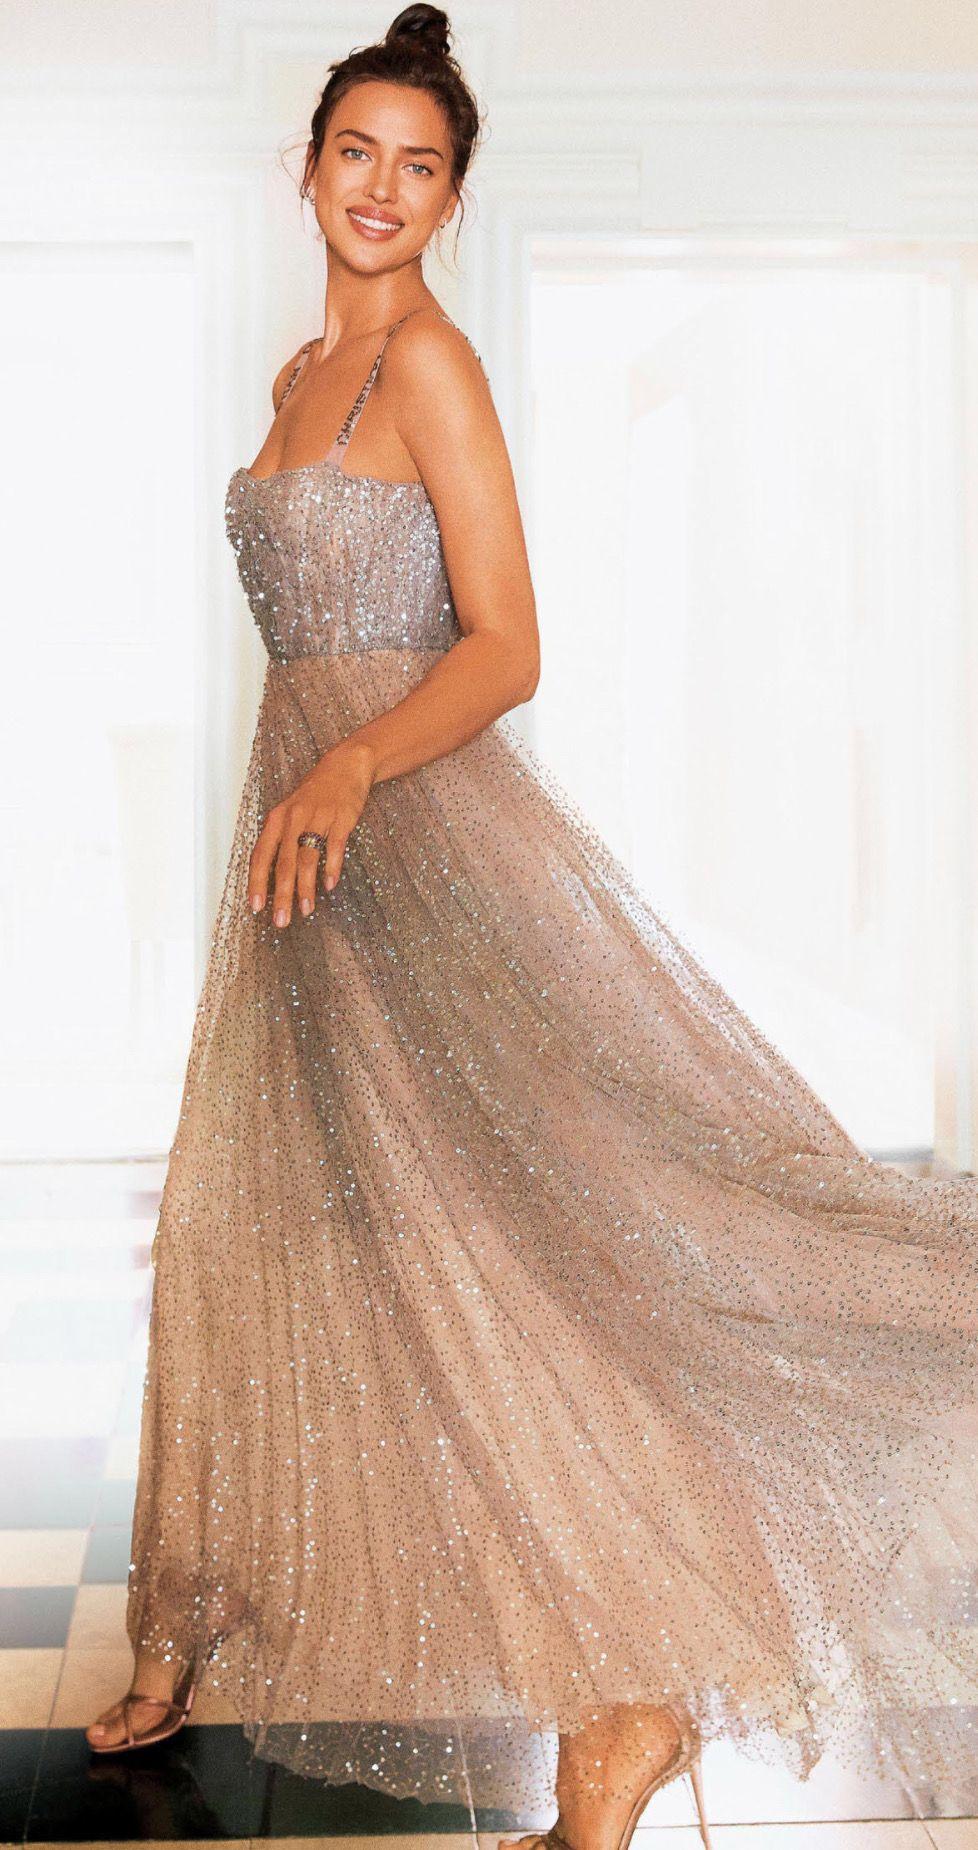 eceb4520b58 Irina Shayk wearing a Dior gown